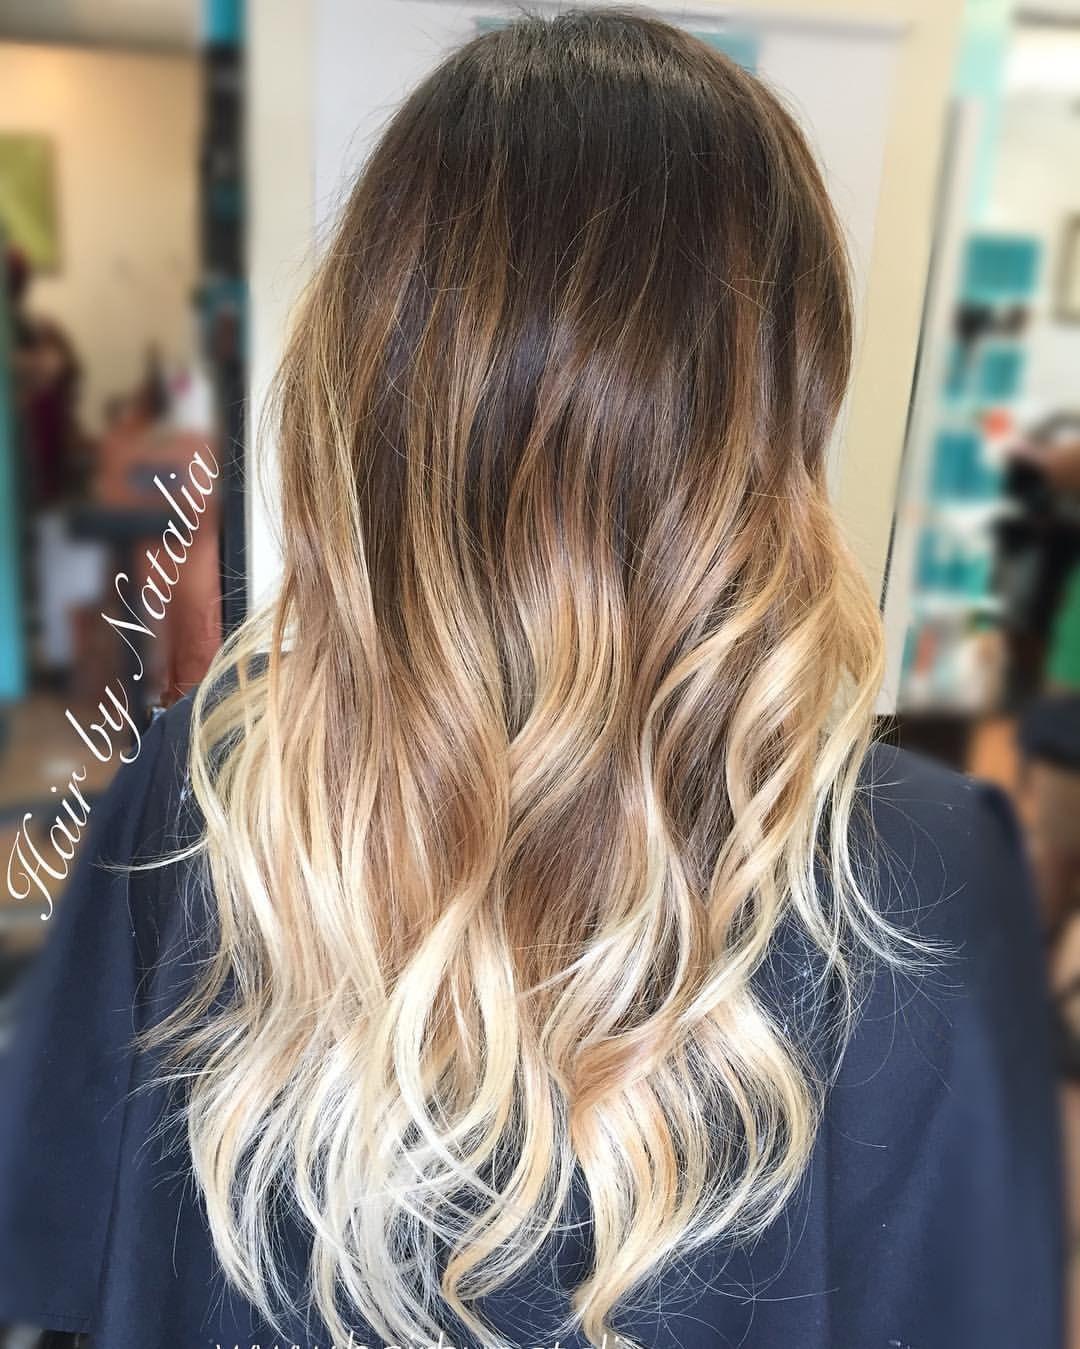 Balayage hair balyage hair blonde balyage brown balyage caramel highlights highlighted hair - Balayage blond caramel ...